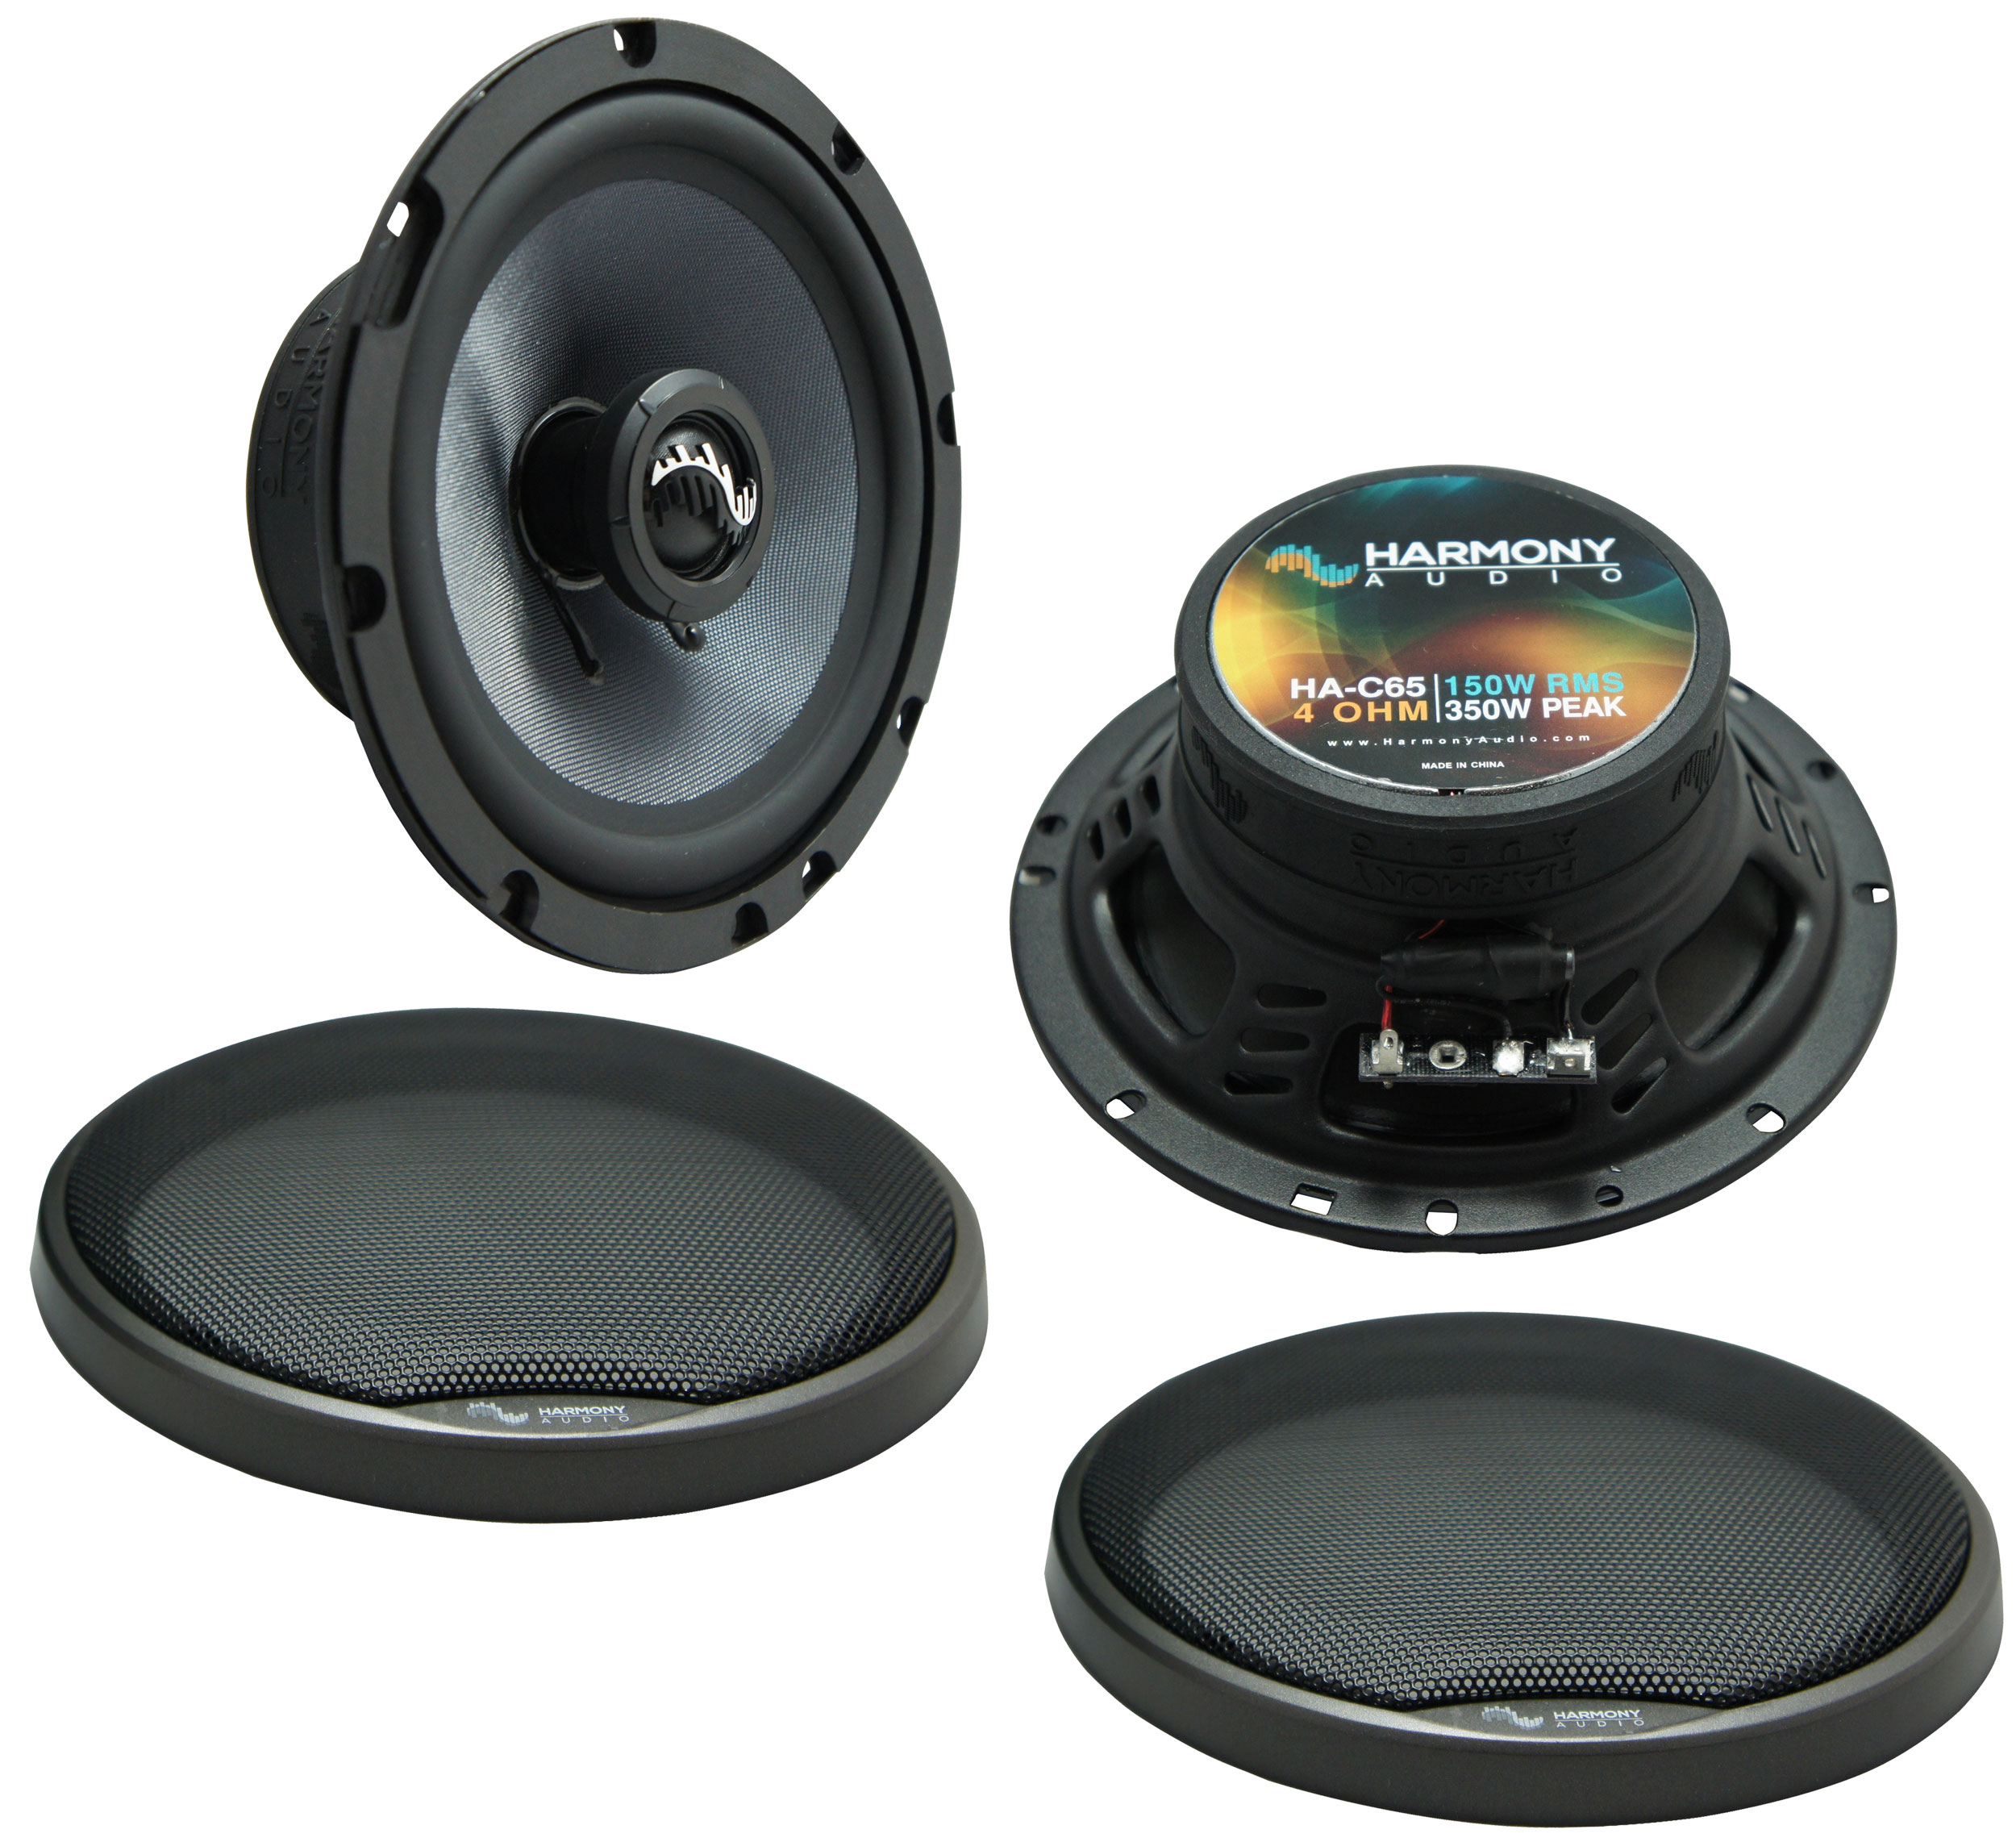 Fits Dodge Dakota 2005-2007 Front Door Replacement Harmony HA-C65 Premium Speakers New